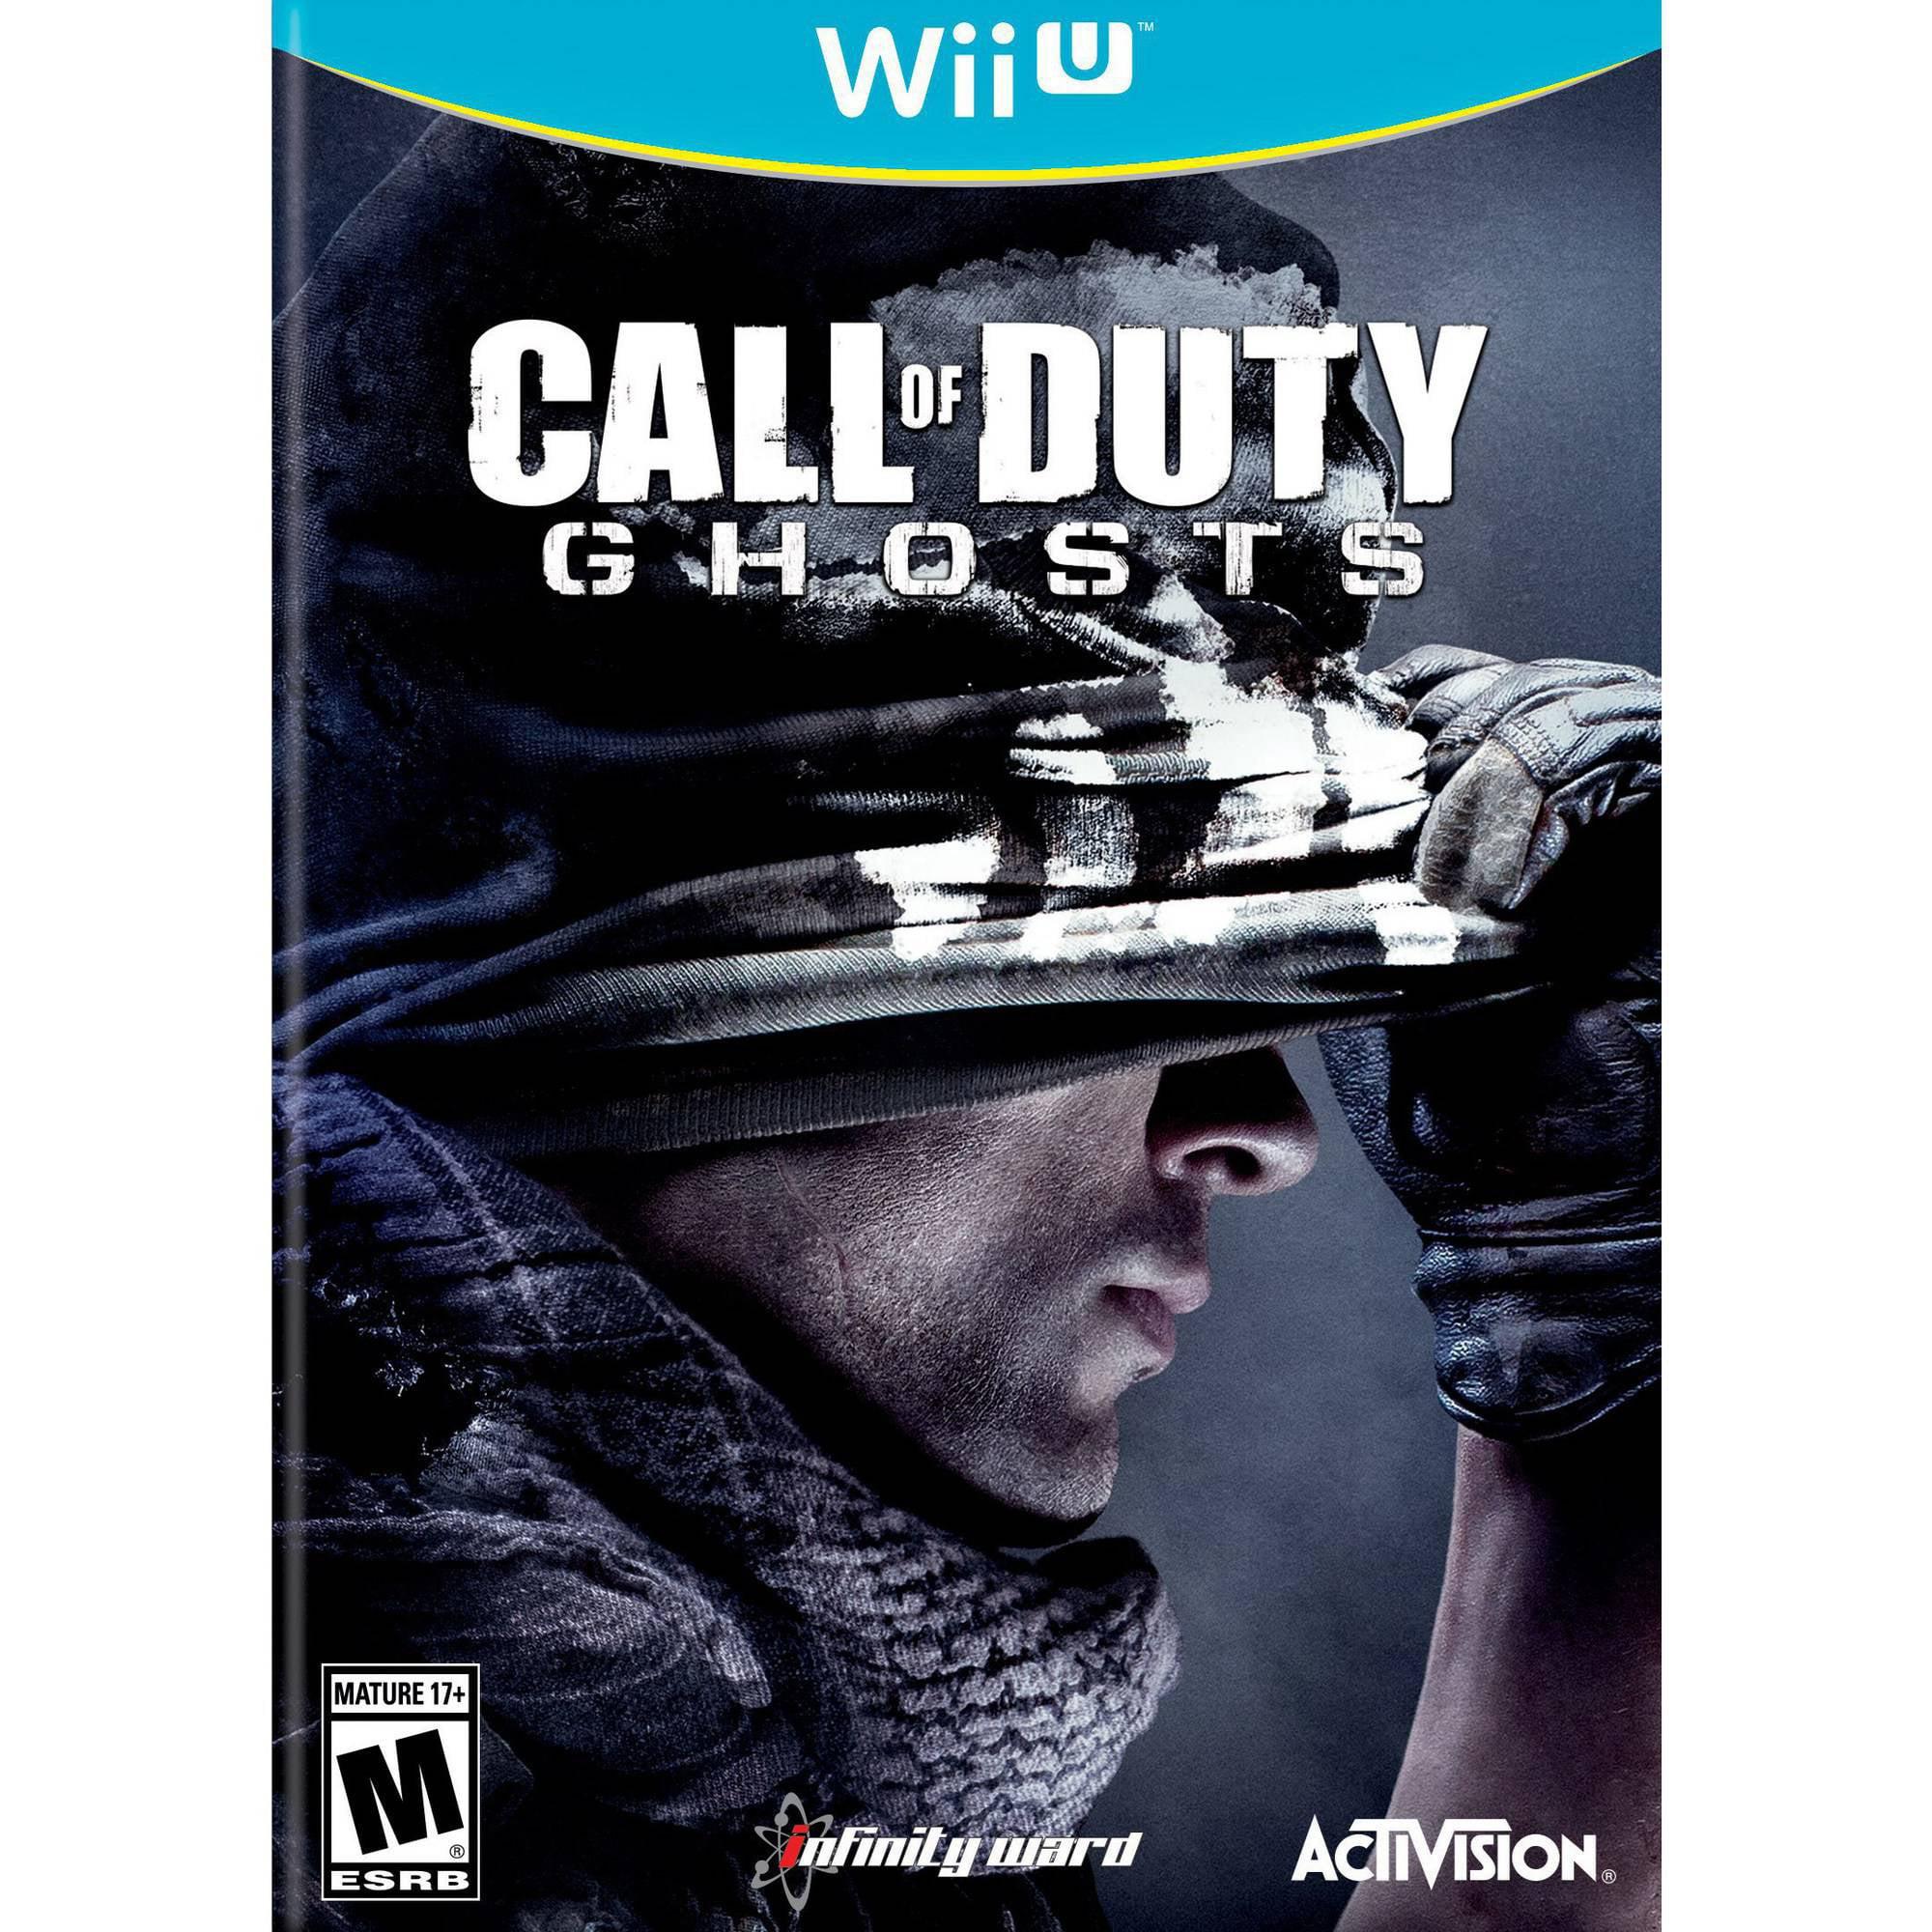 Call of Duty: Ghosts (Wii U)